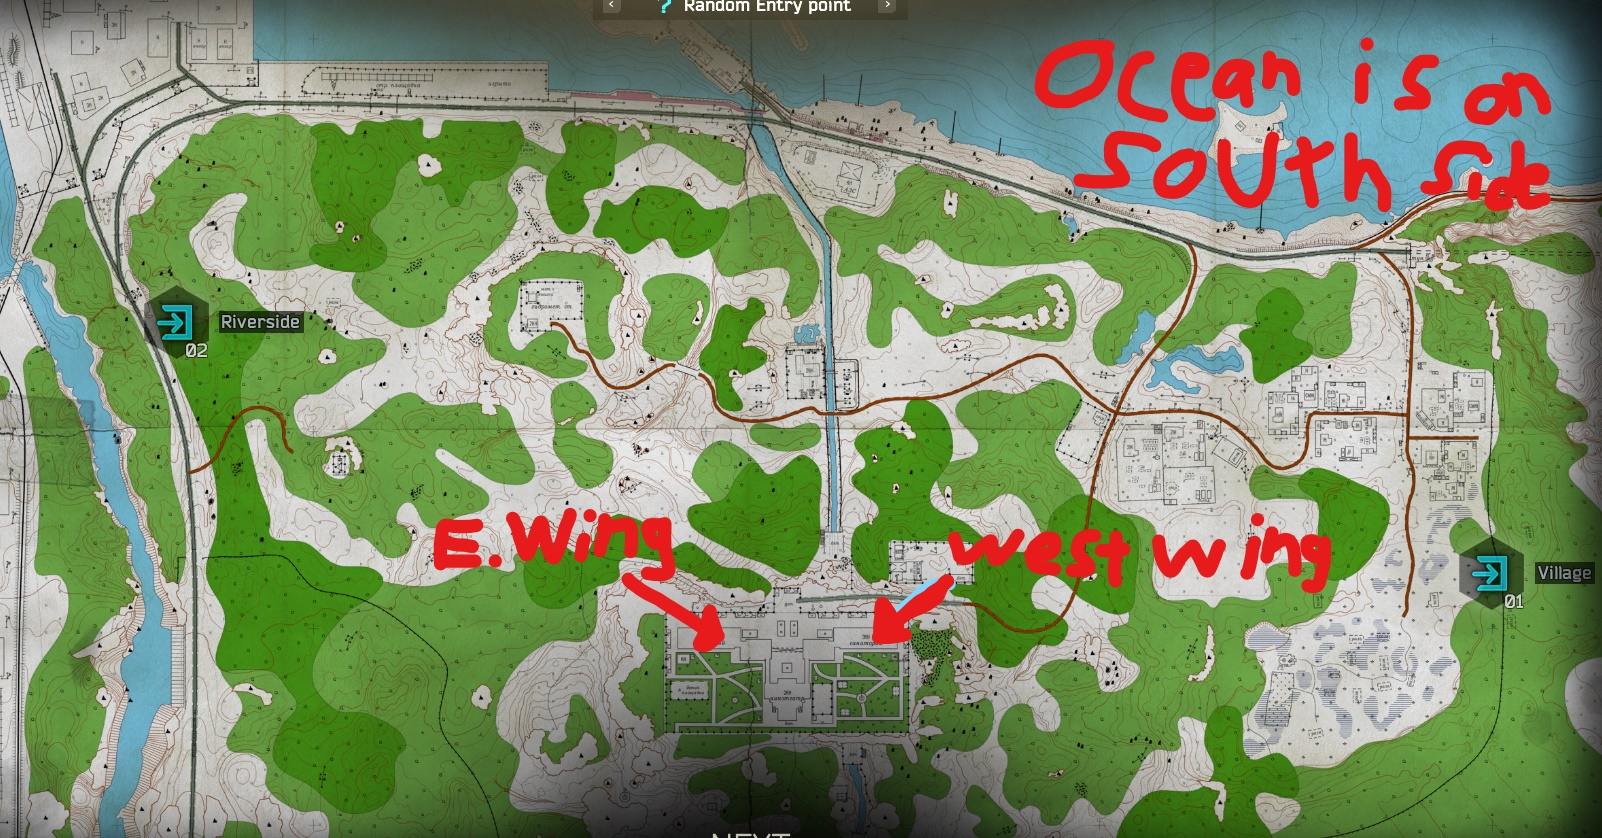 Shoreline Map incorrect - Fix suggested - Questions - Escape